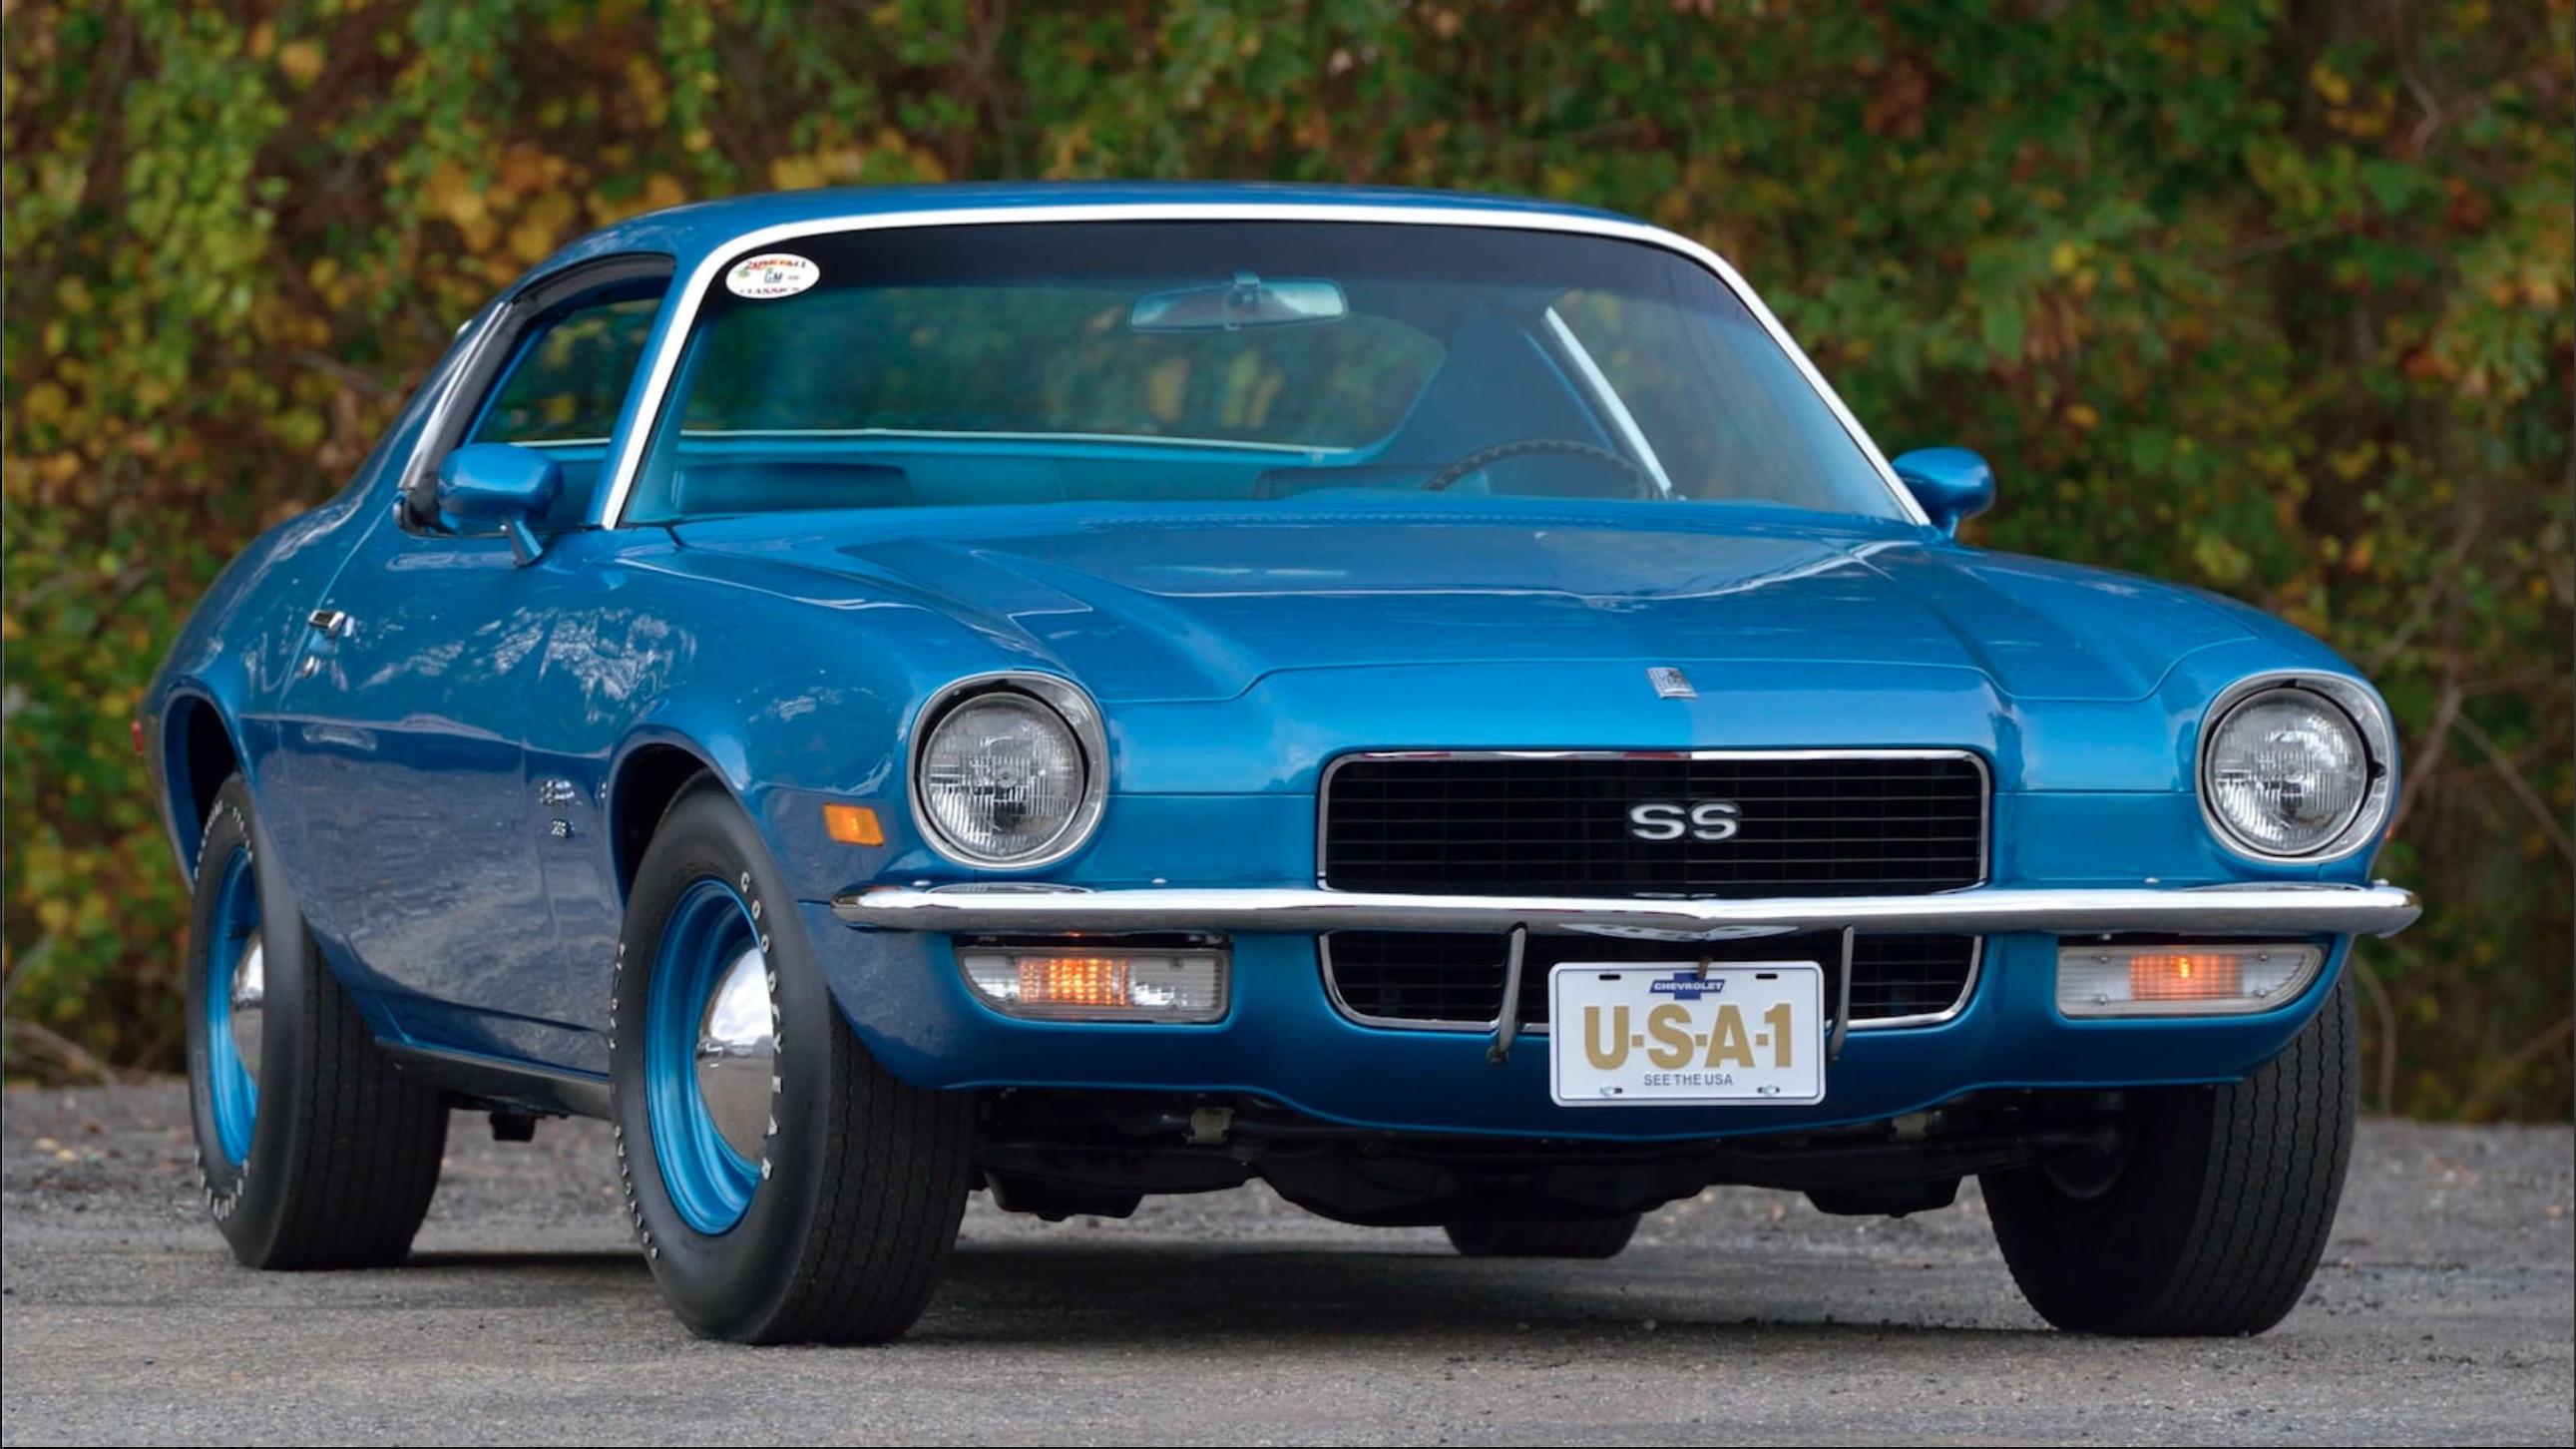 Money No Object: 1970 Chevrolet Camaro SS L78